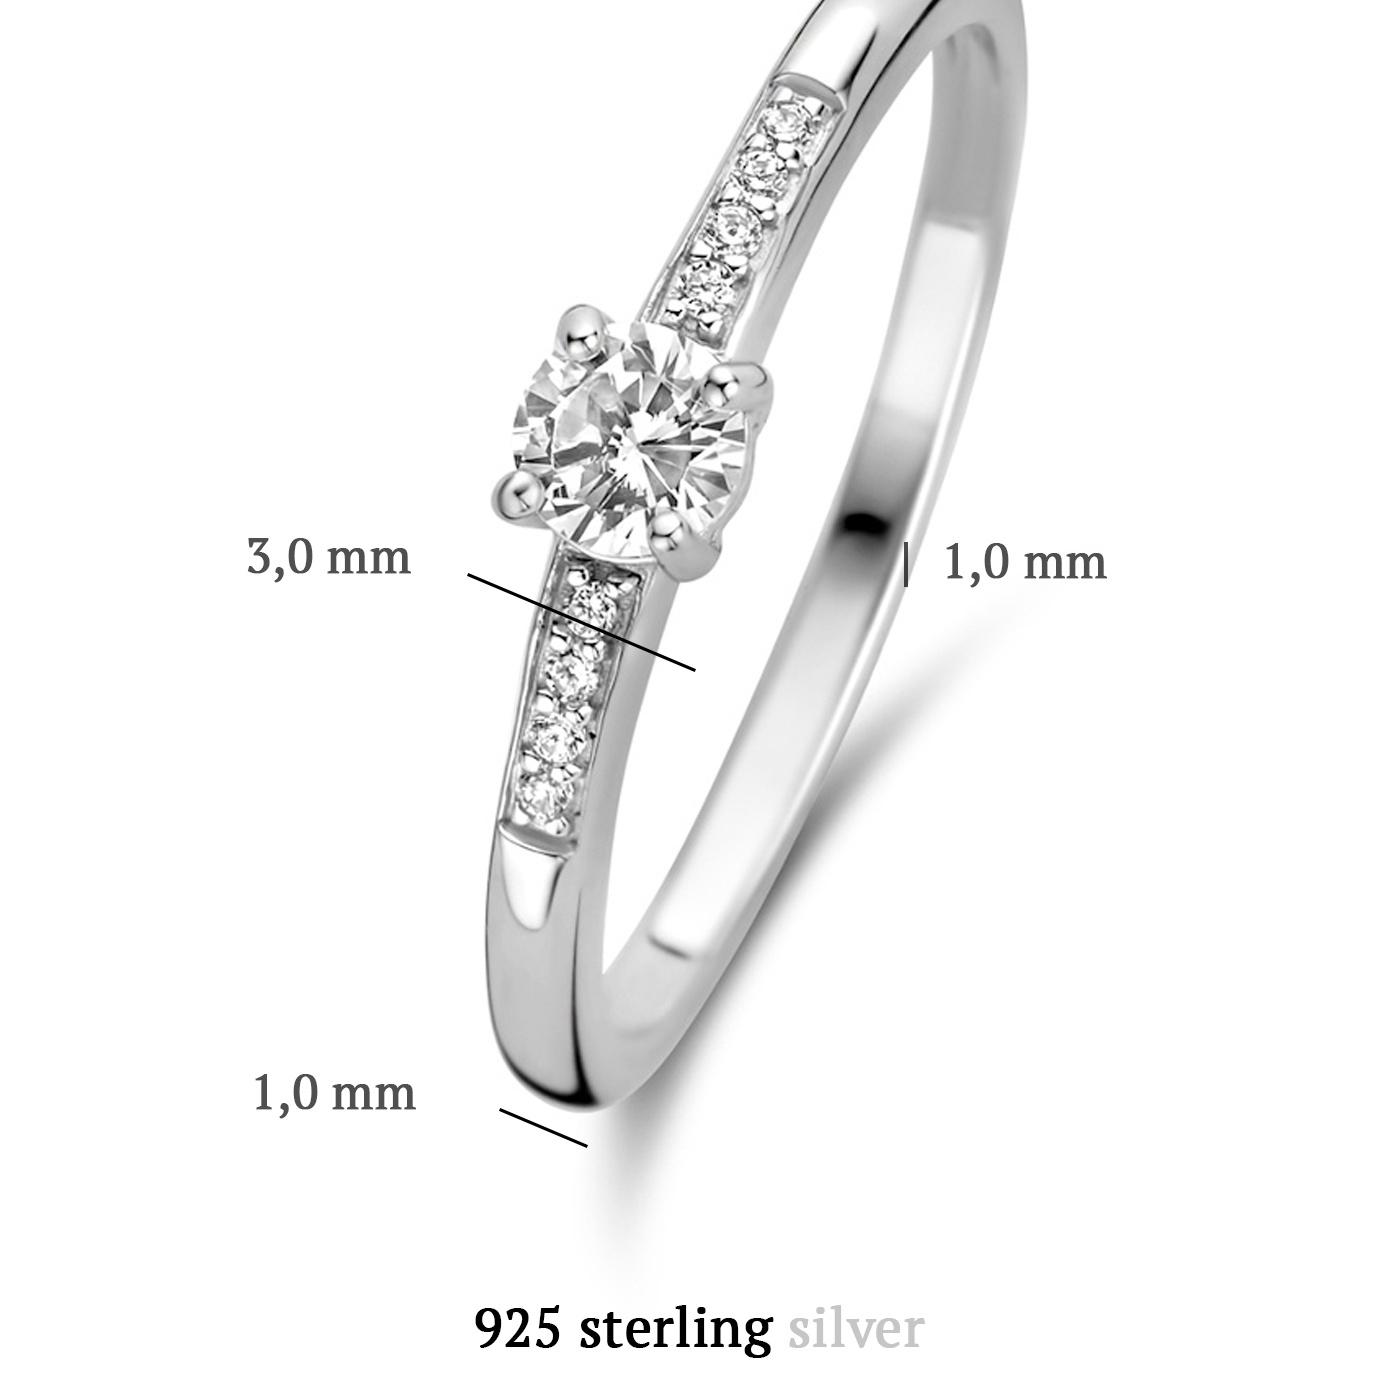 Parte di Me Ponte Vecchio Pitti 925 sterling zilveren ring met zirkonia